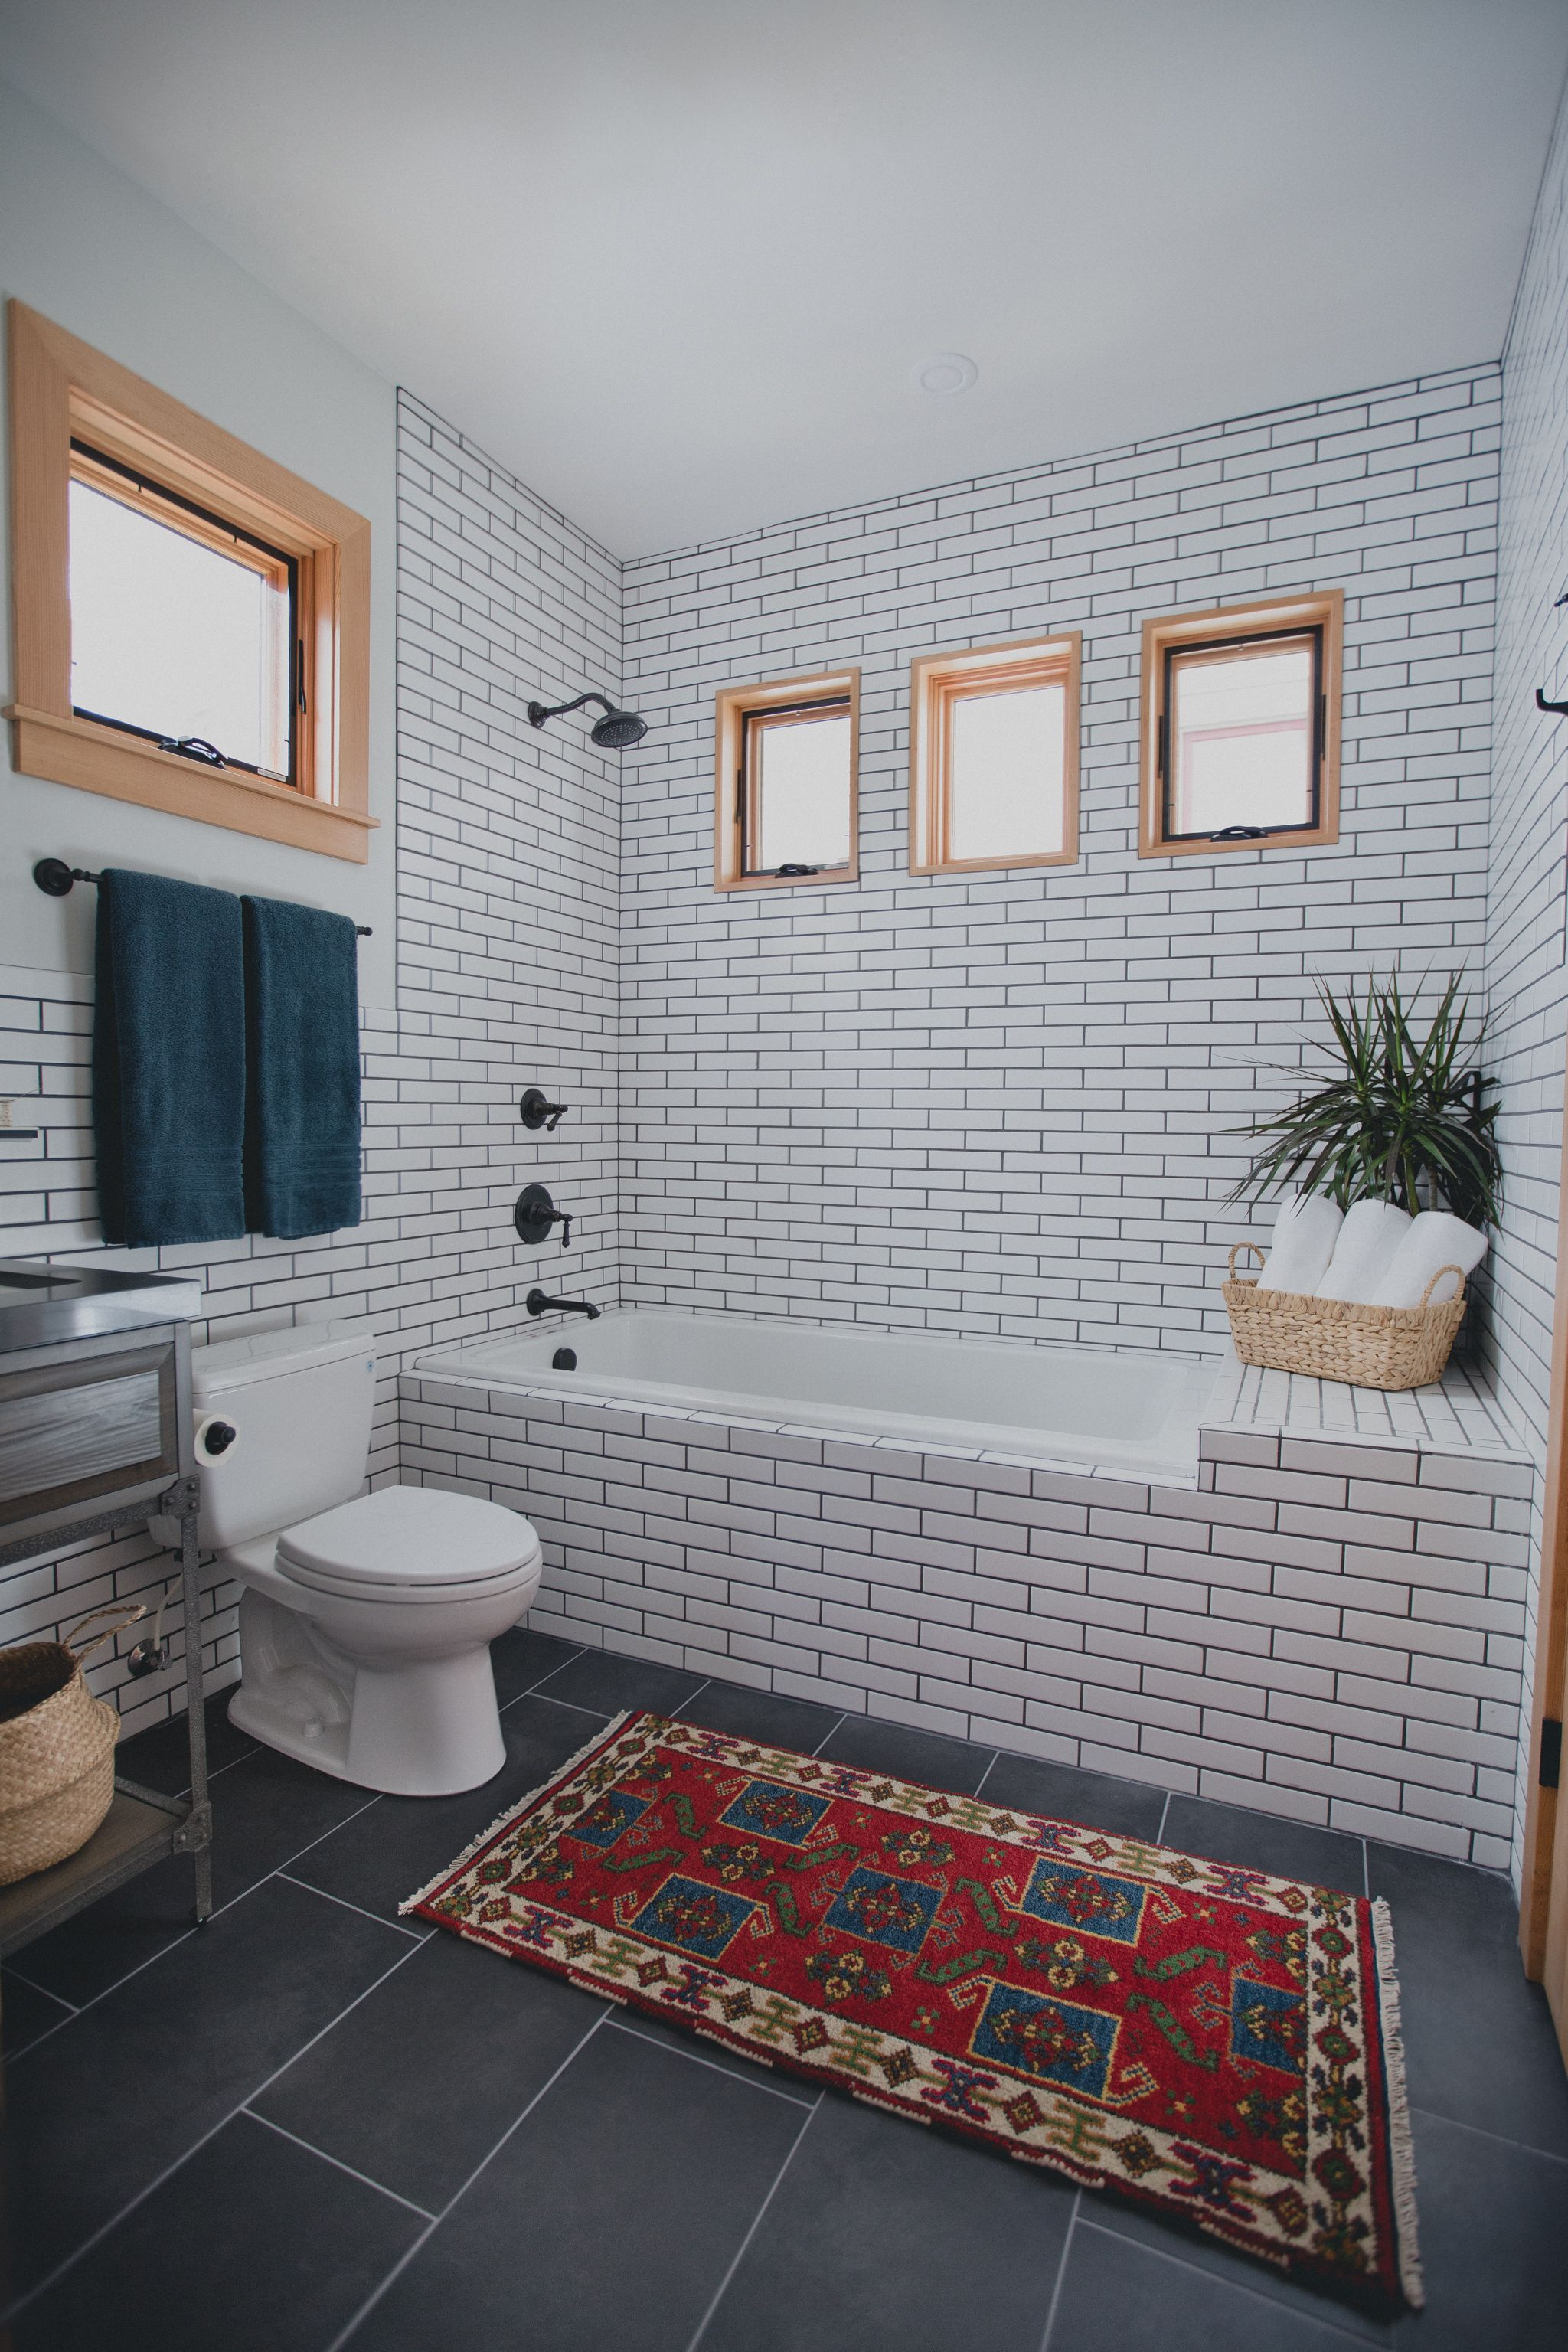 Pental Surfaces Up Tile In Black Http Www Pentalonline Com Blog P 4622 Small Bathroom Decor Bathroom Decor Small Bathroom